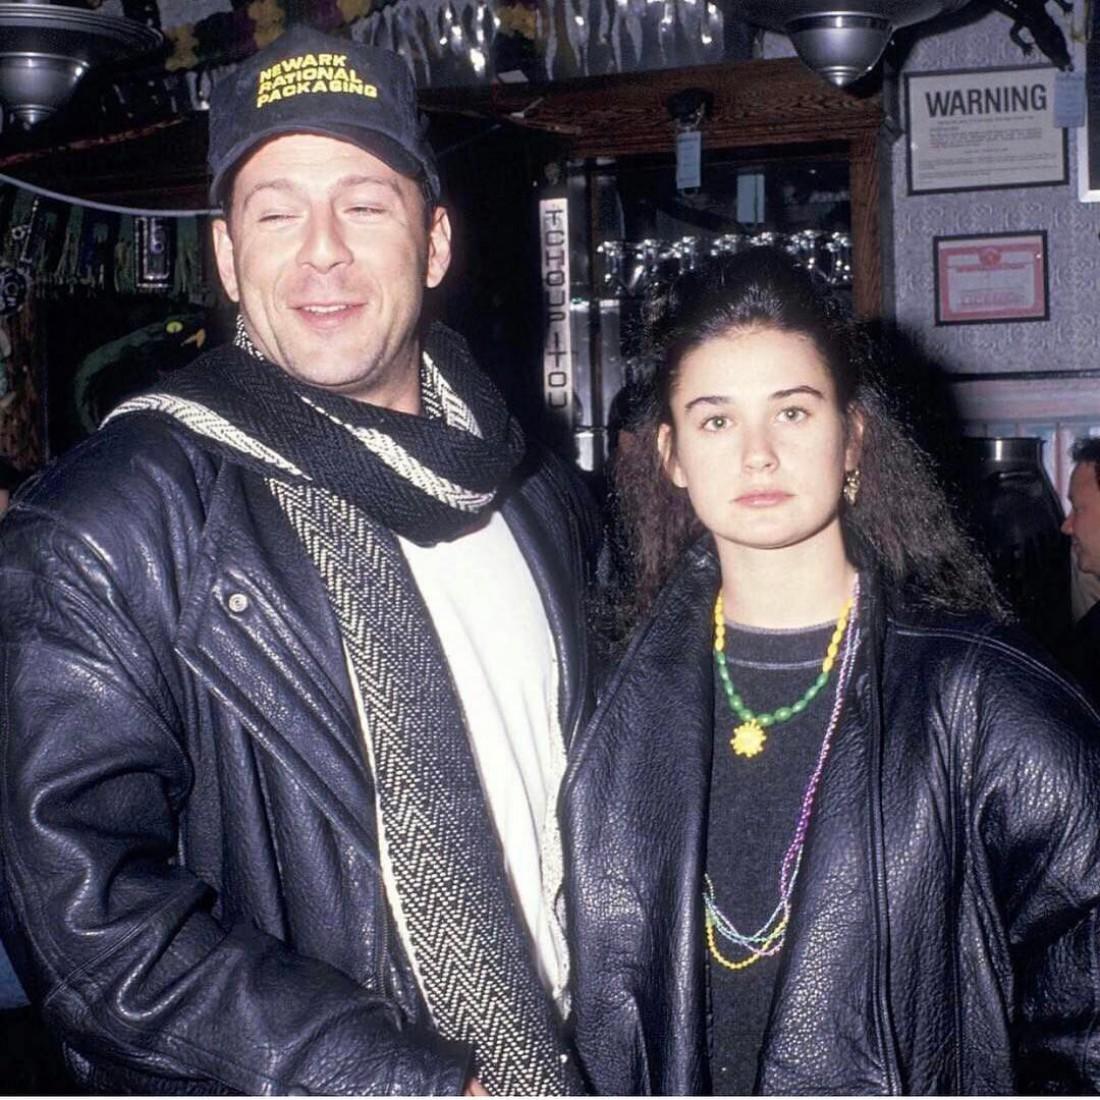 Брюс Уиллис и Деми Мур. Фото, которое опубликовал Потап